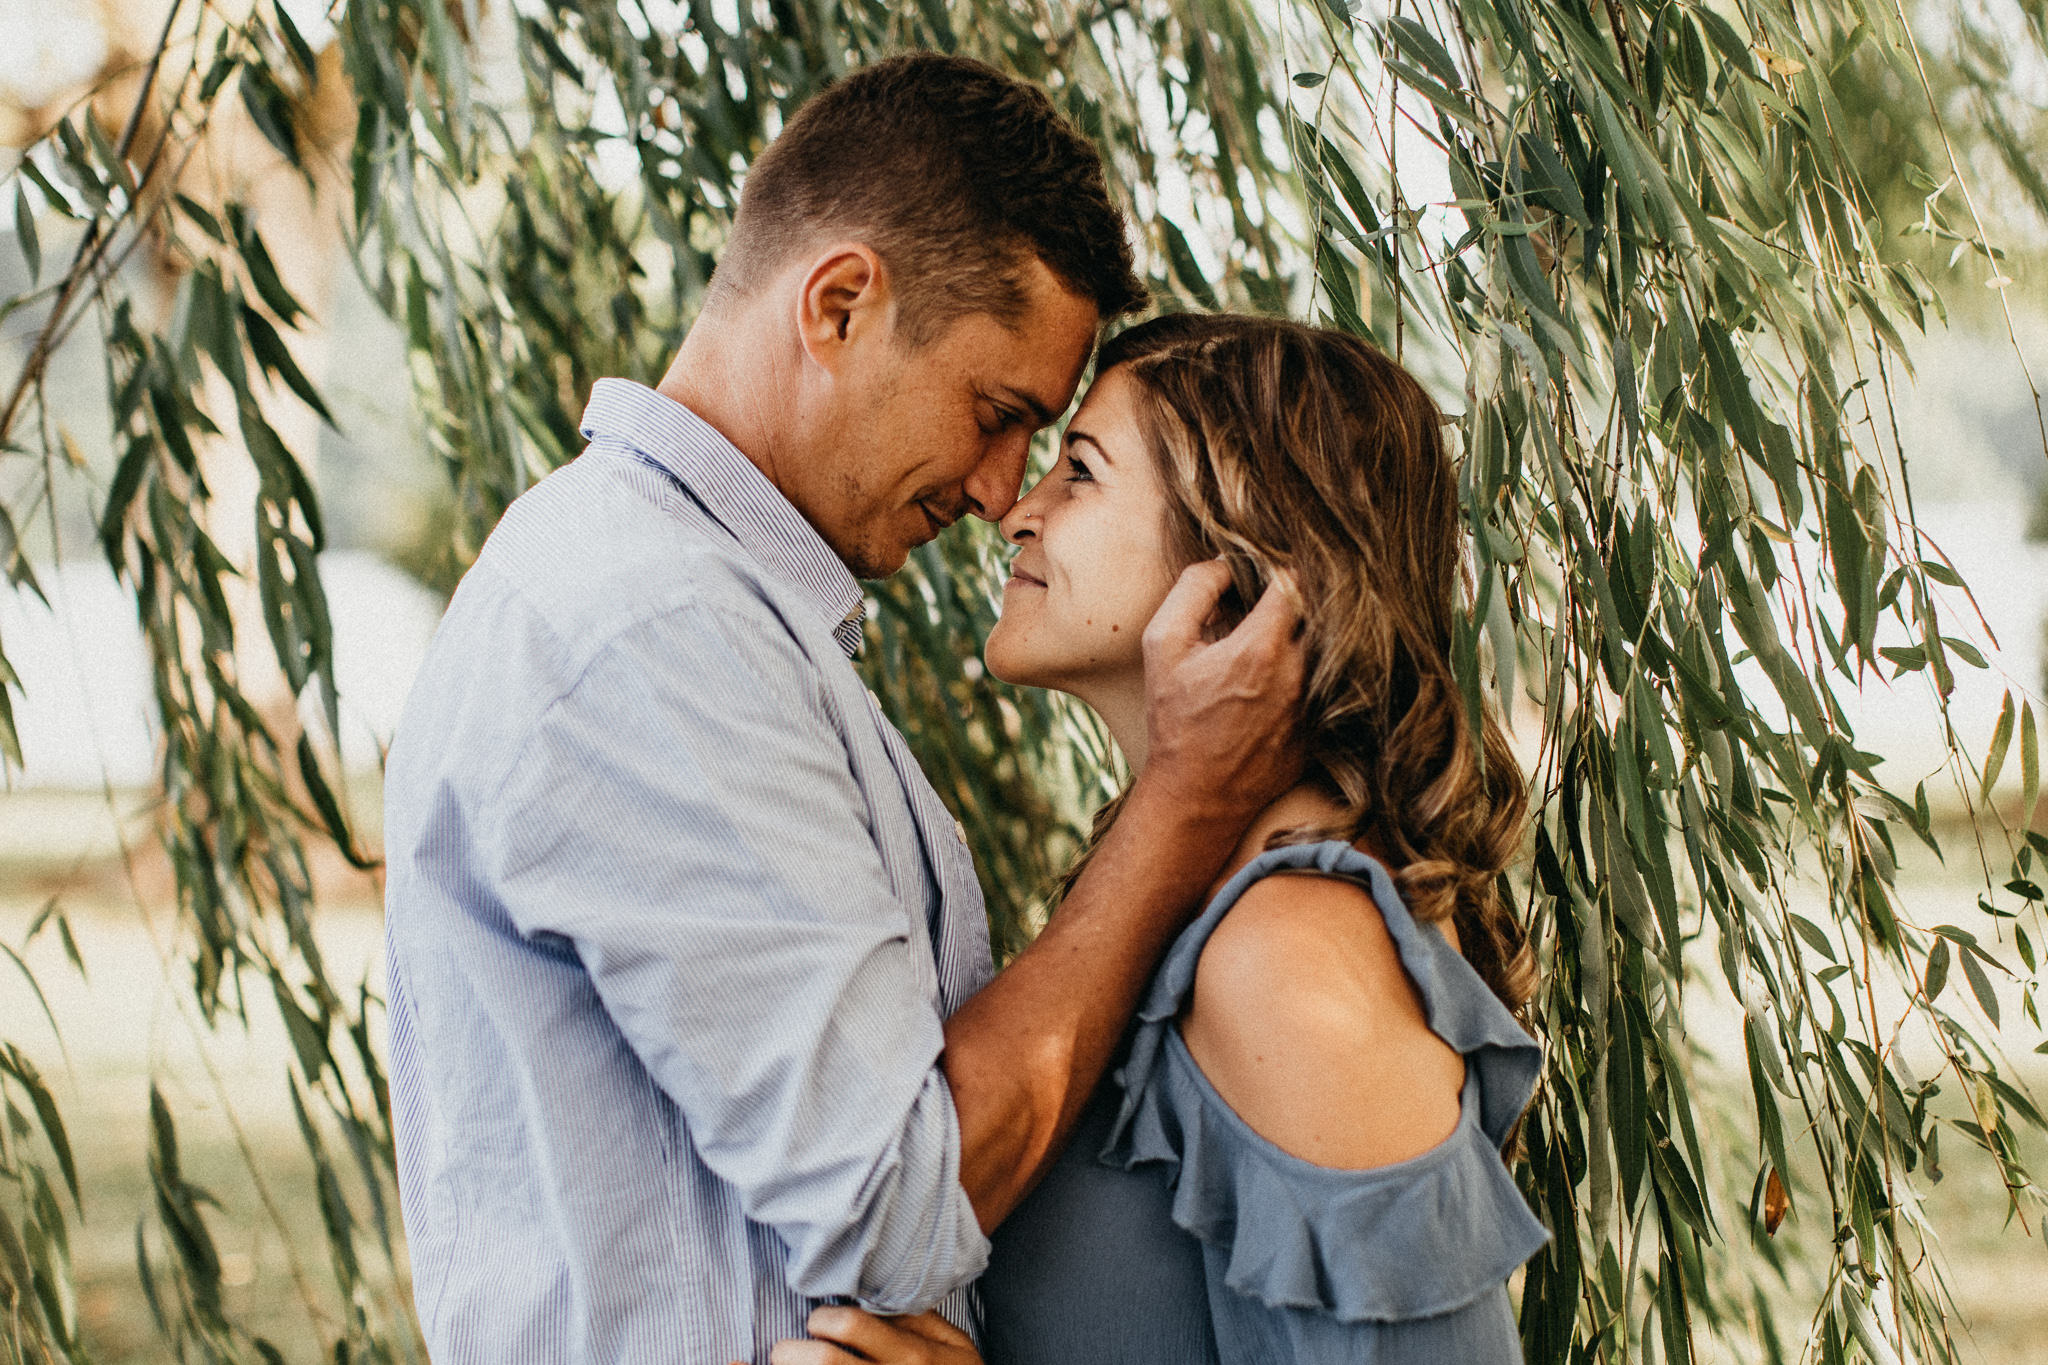 Claytor Lake State Park - Engagement portraits - Virginia wedding photographer - Pat Cori Photography-10.jpg